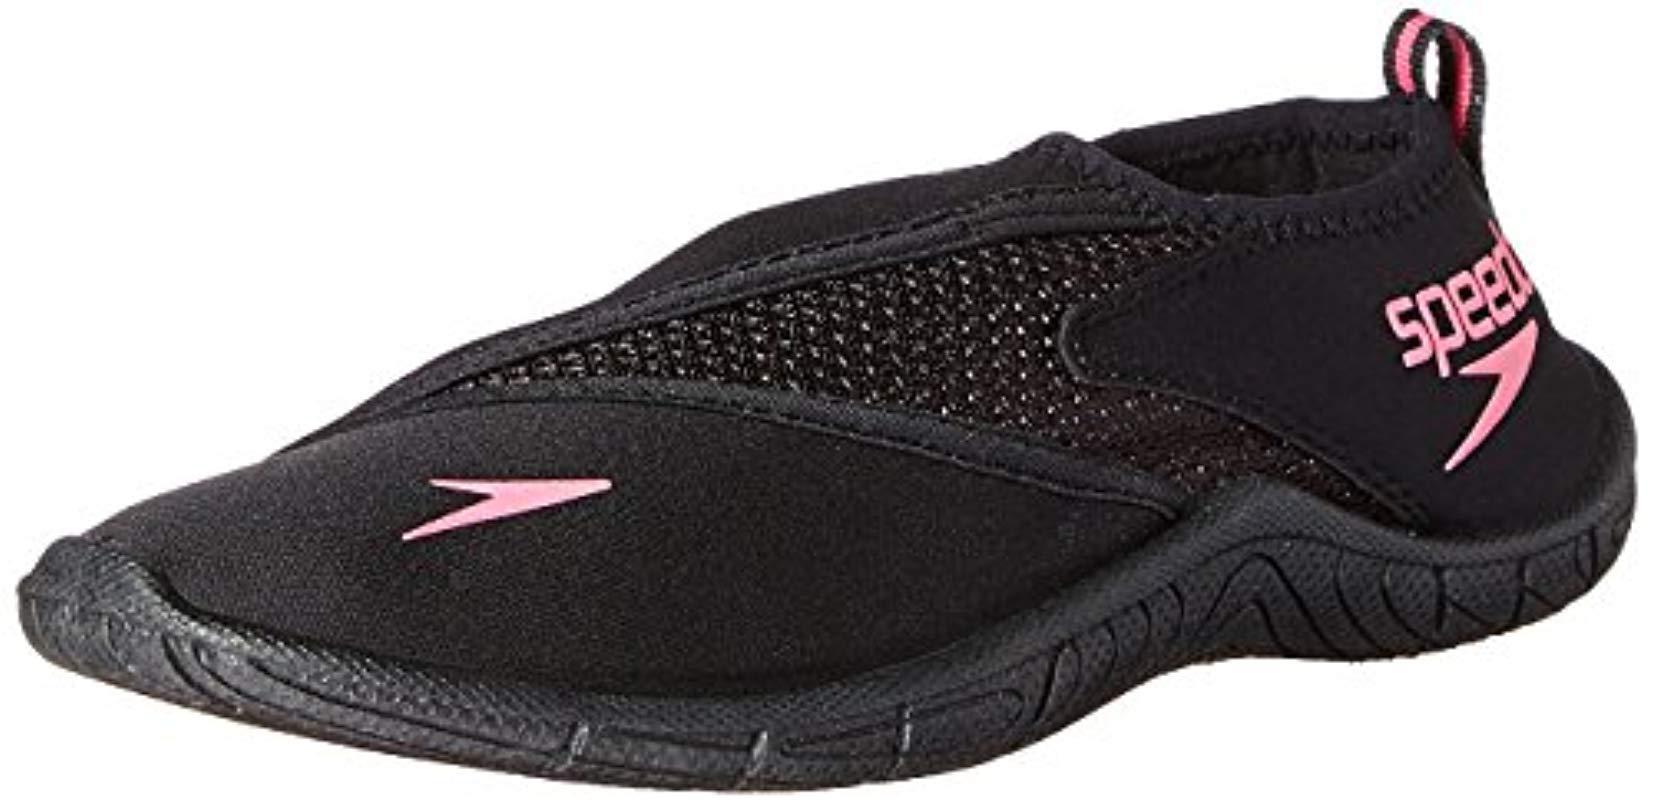 d427c7b7ec51 Lyst - Speedo Surfwalker 3.0 Water Shoe in Black - Save 25%